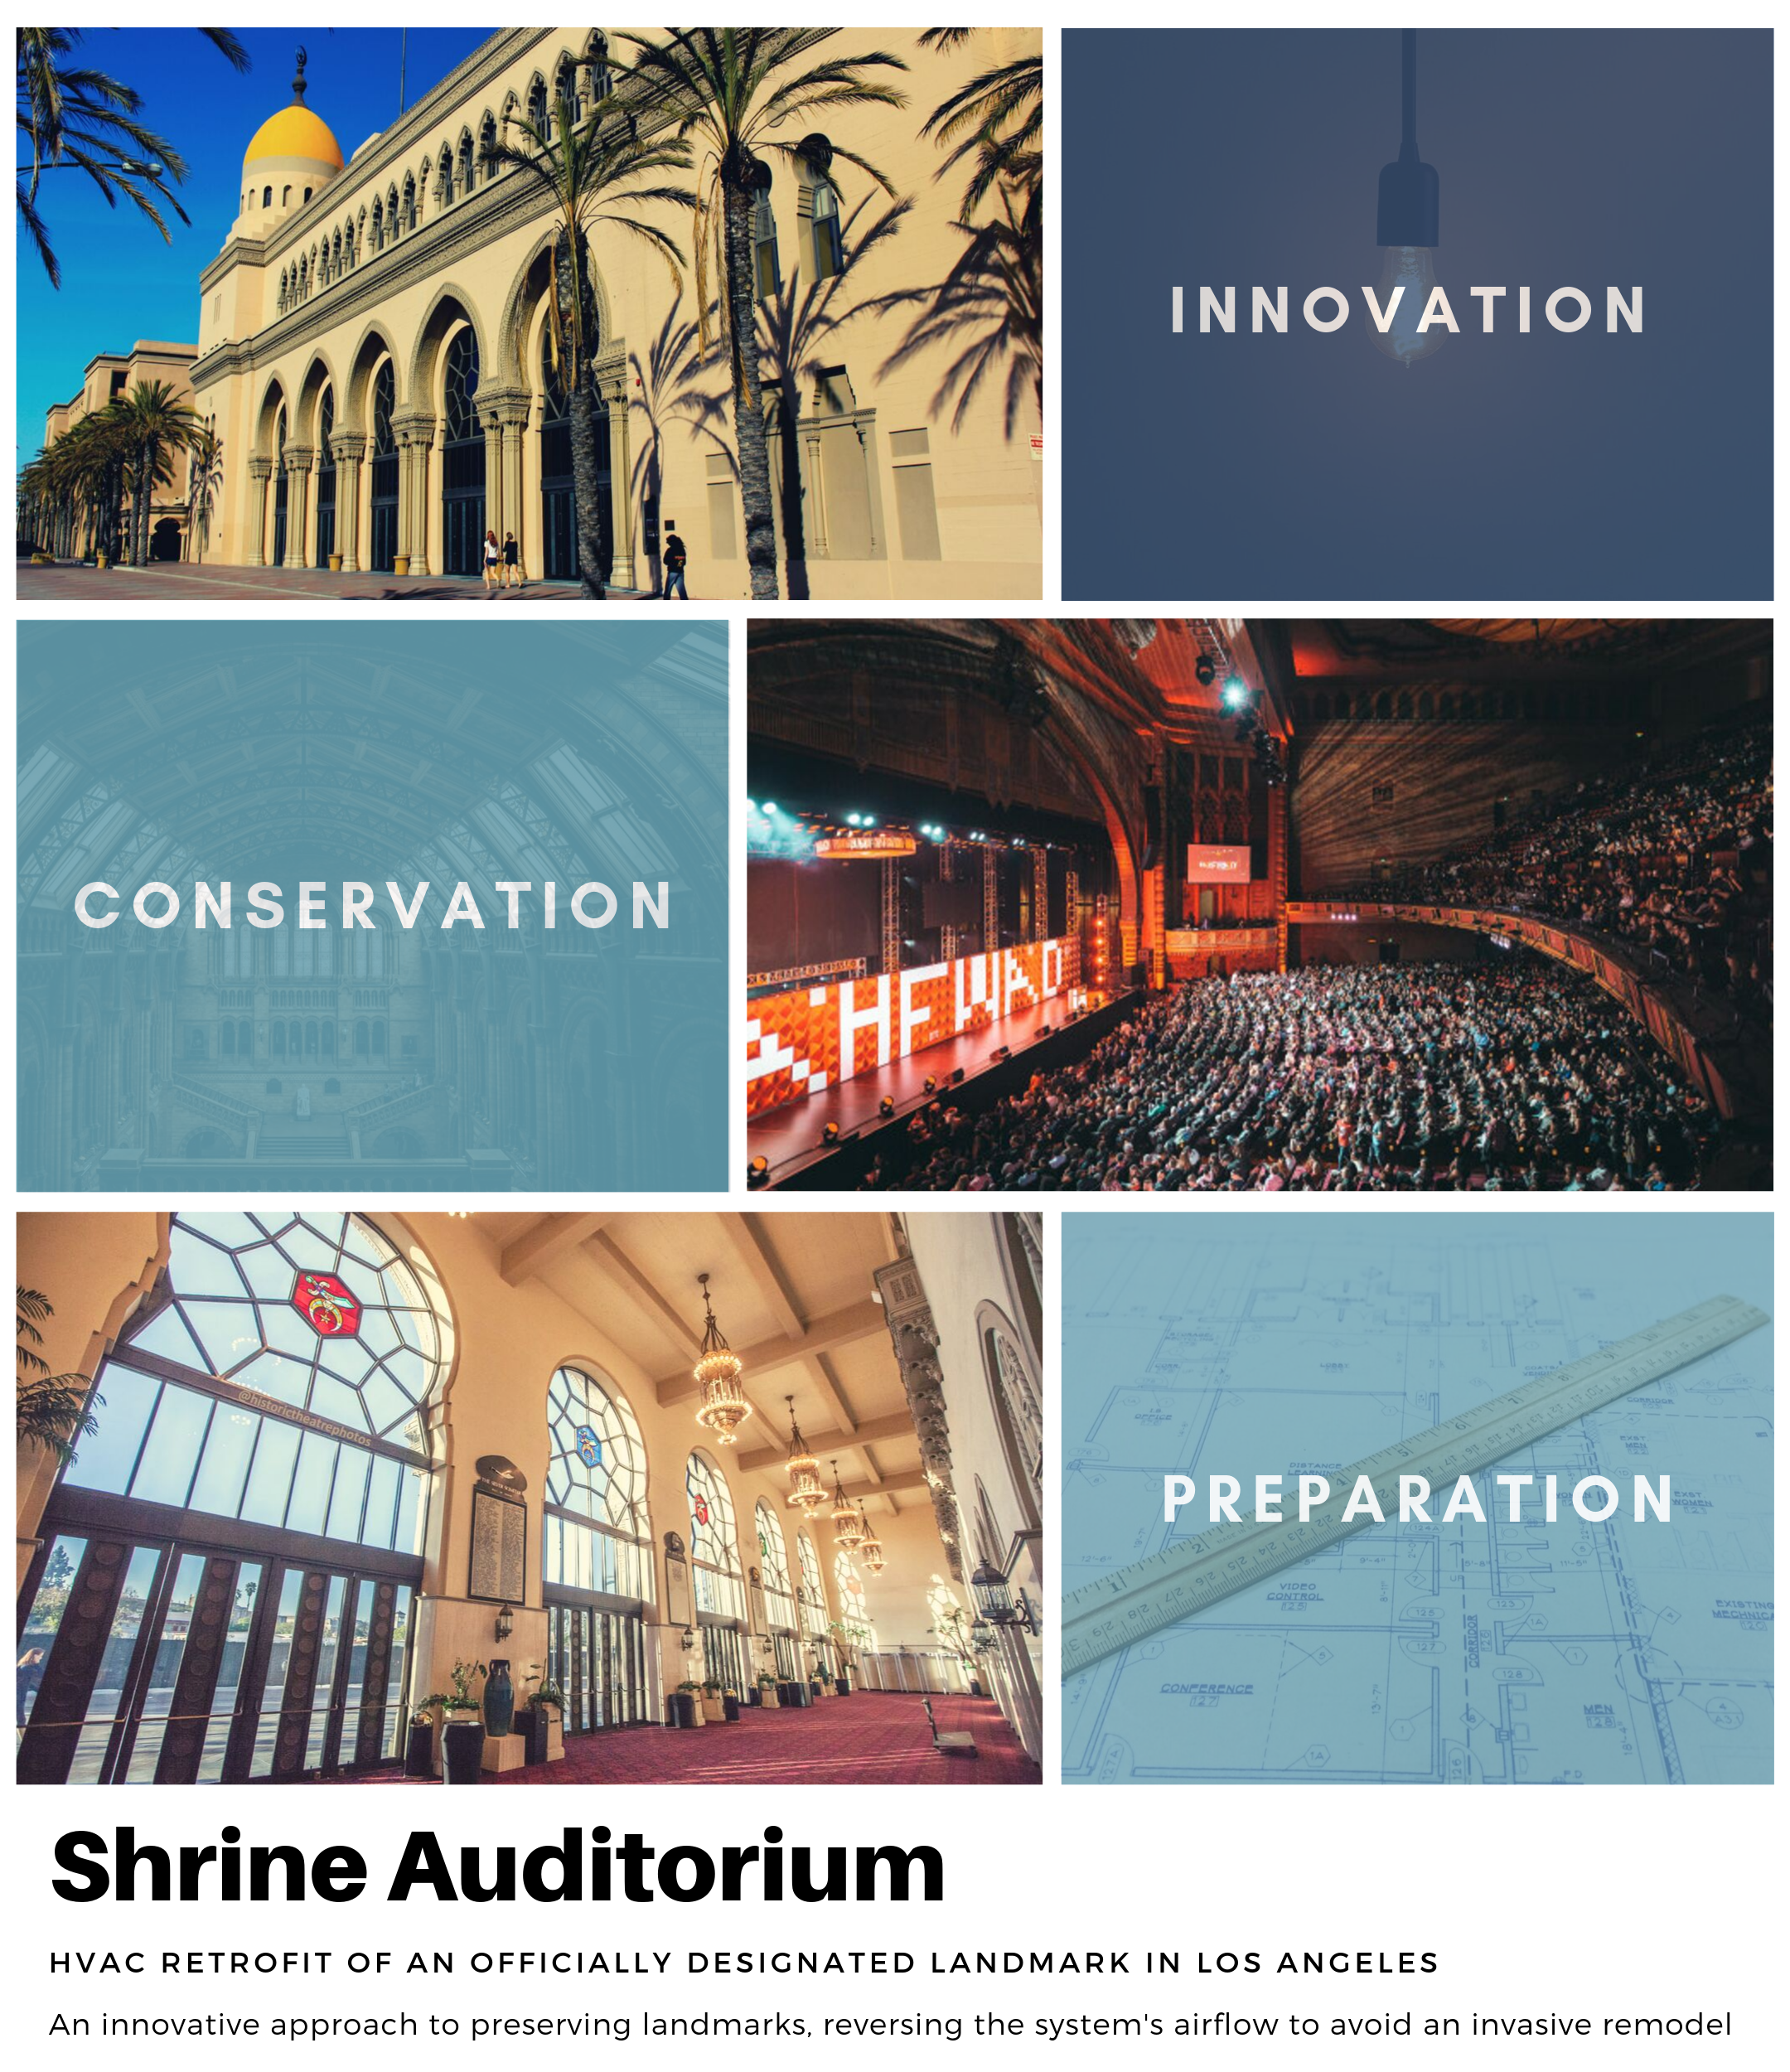 Shrine Auditorium Hvac System With Images Architecture Landmark System Architecture Hvac Design